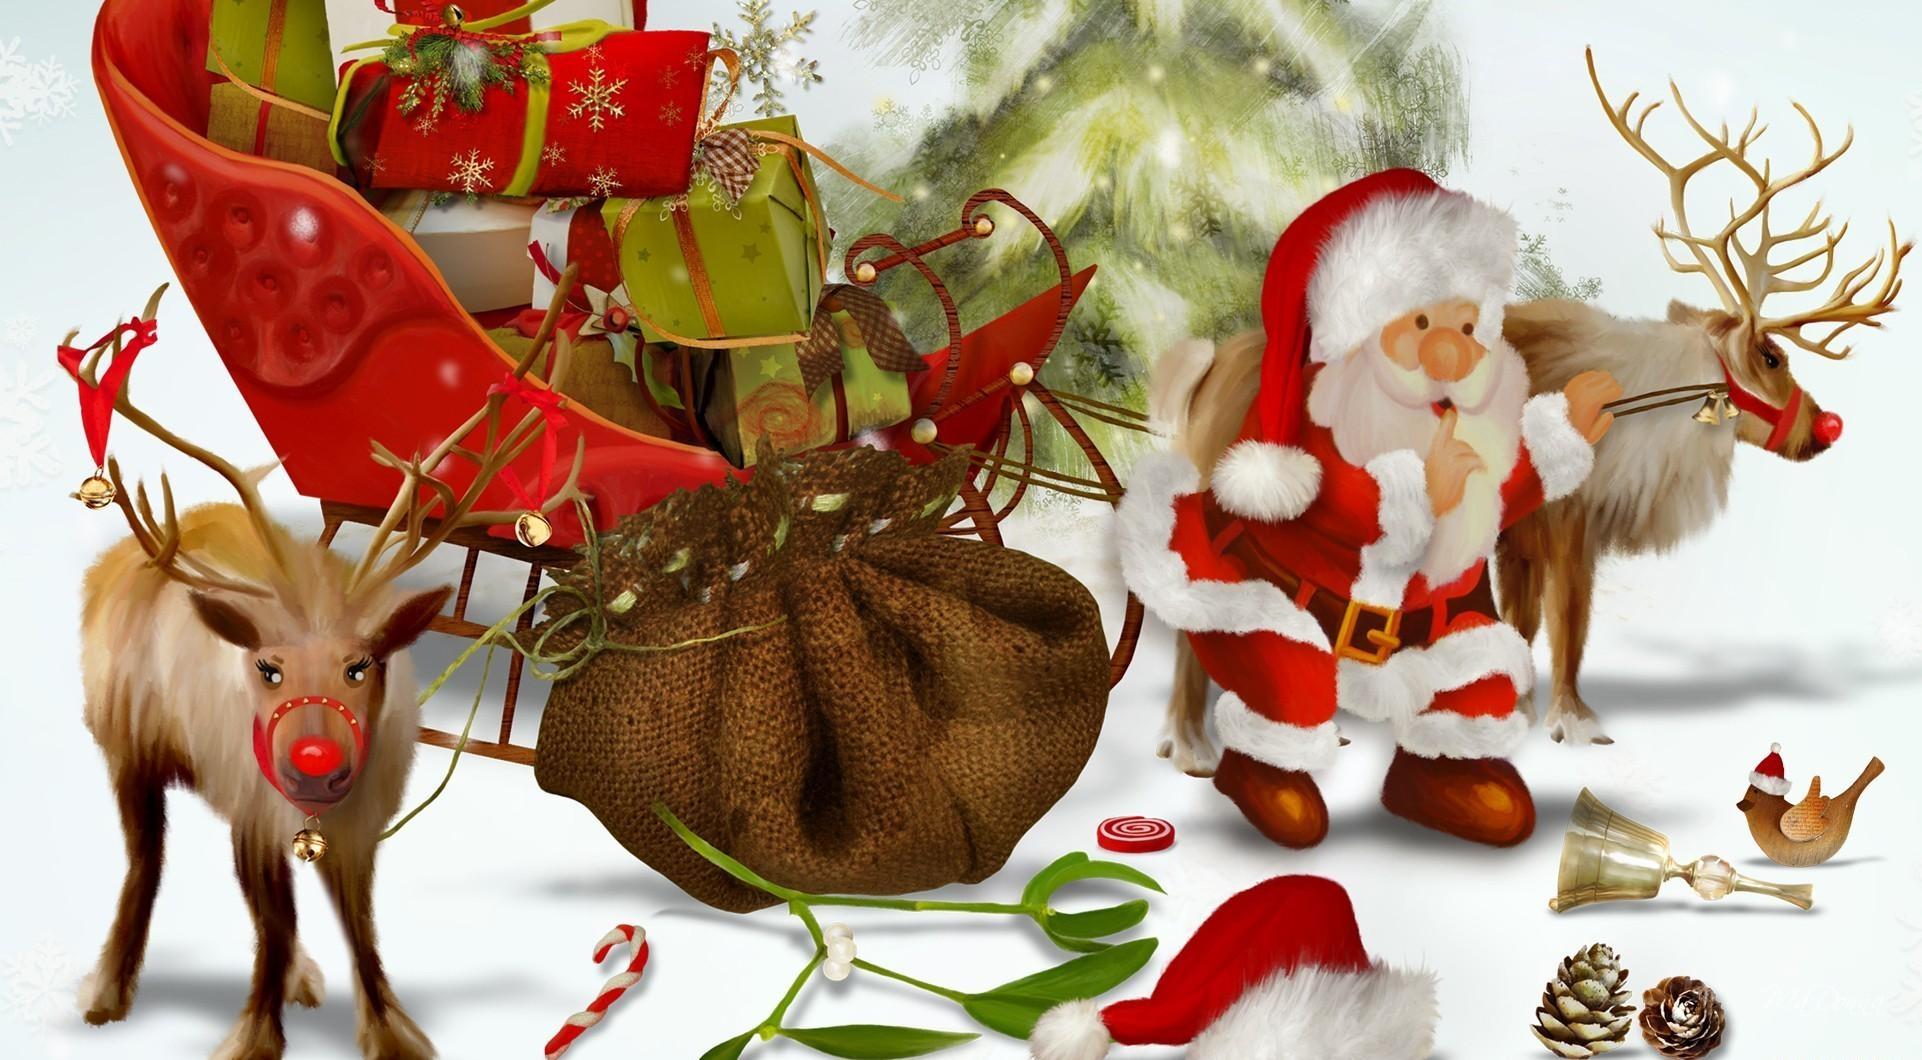 82158 скачать обои Праздники, Санта Клаус, Олени, Подарки, Мешок, Елка, Шишки, Птица - заставки и картинки бесплатно